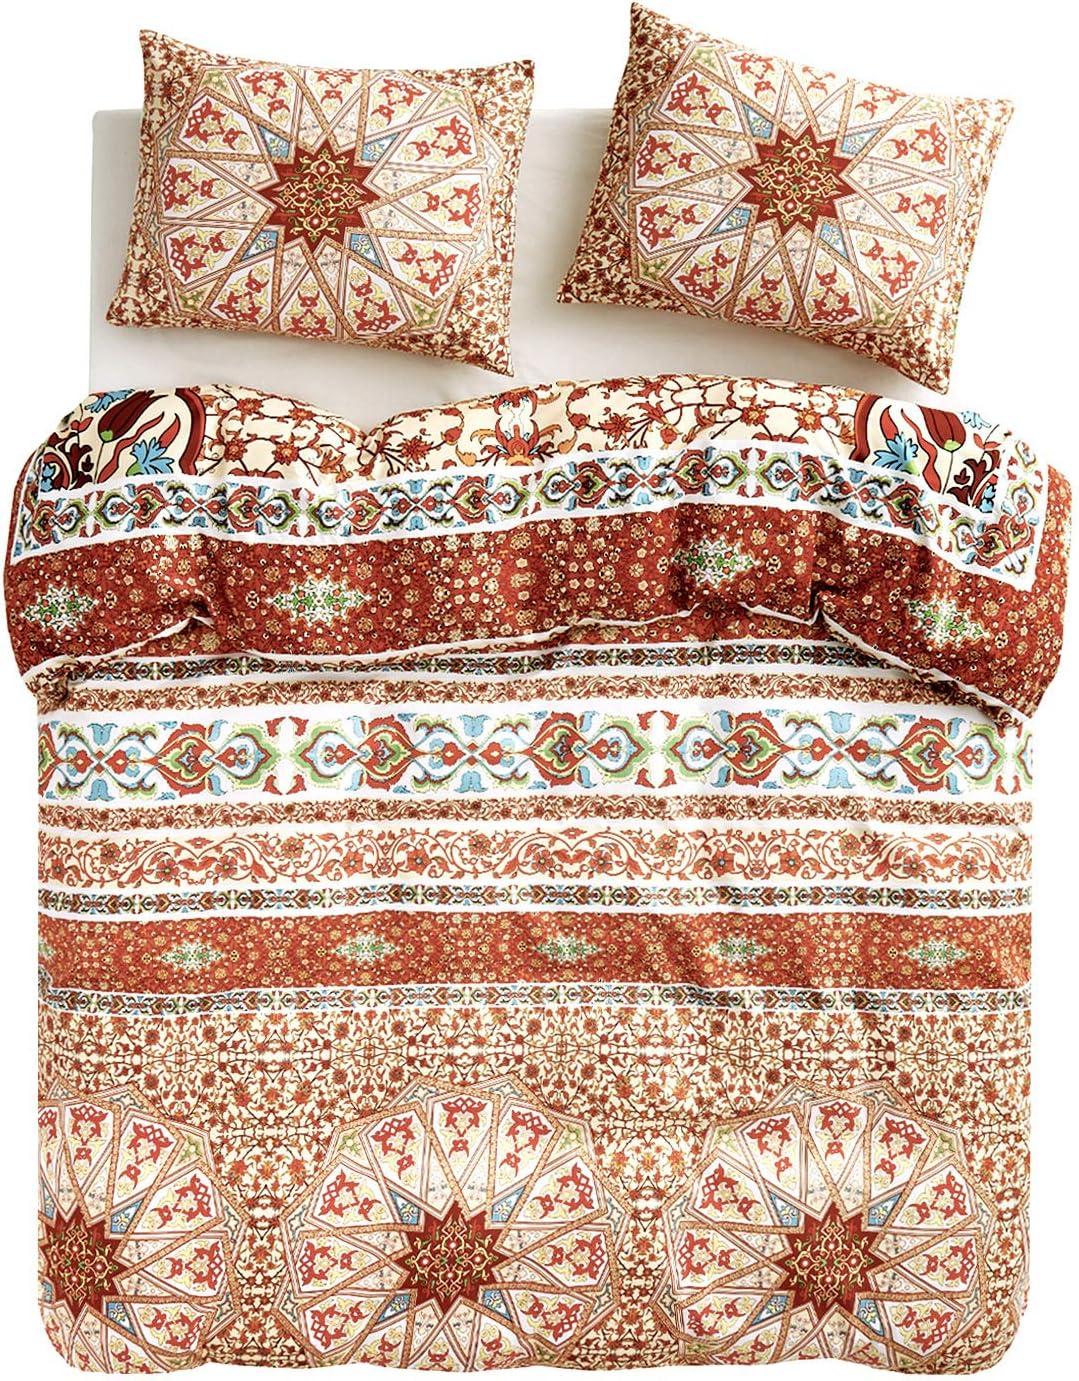 Wake In Cloud - Bohemian Duvet Cover Set, Orange Chic Mandala Medallion Printed Soft Microfiber Bedding with Zipper Closure (3pcs, Queen Size)